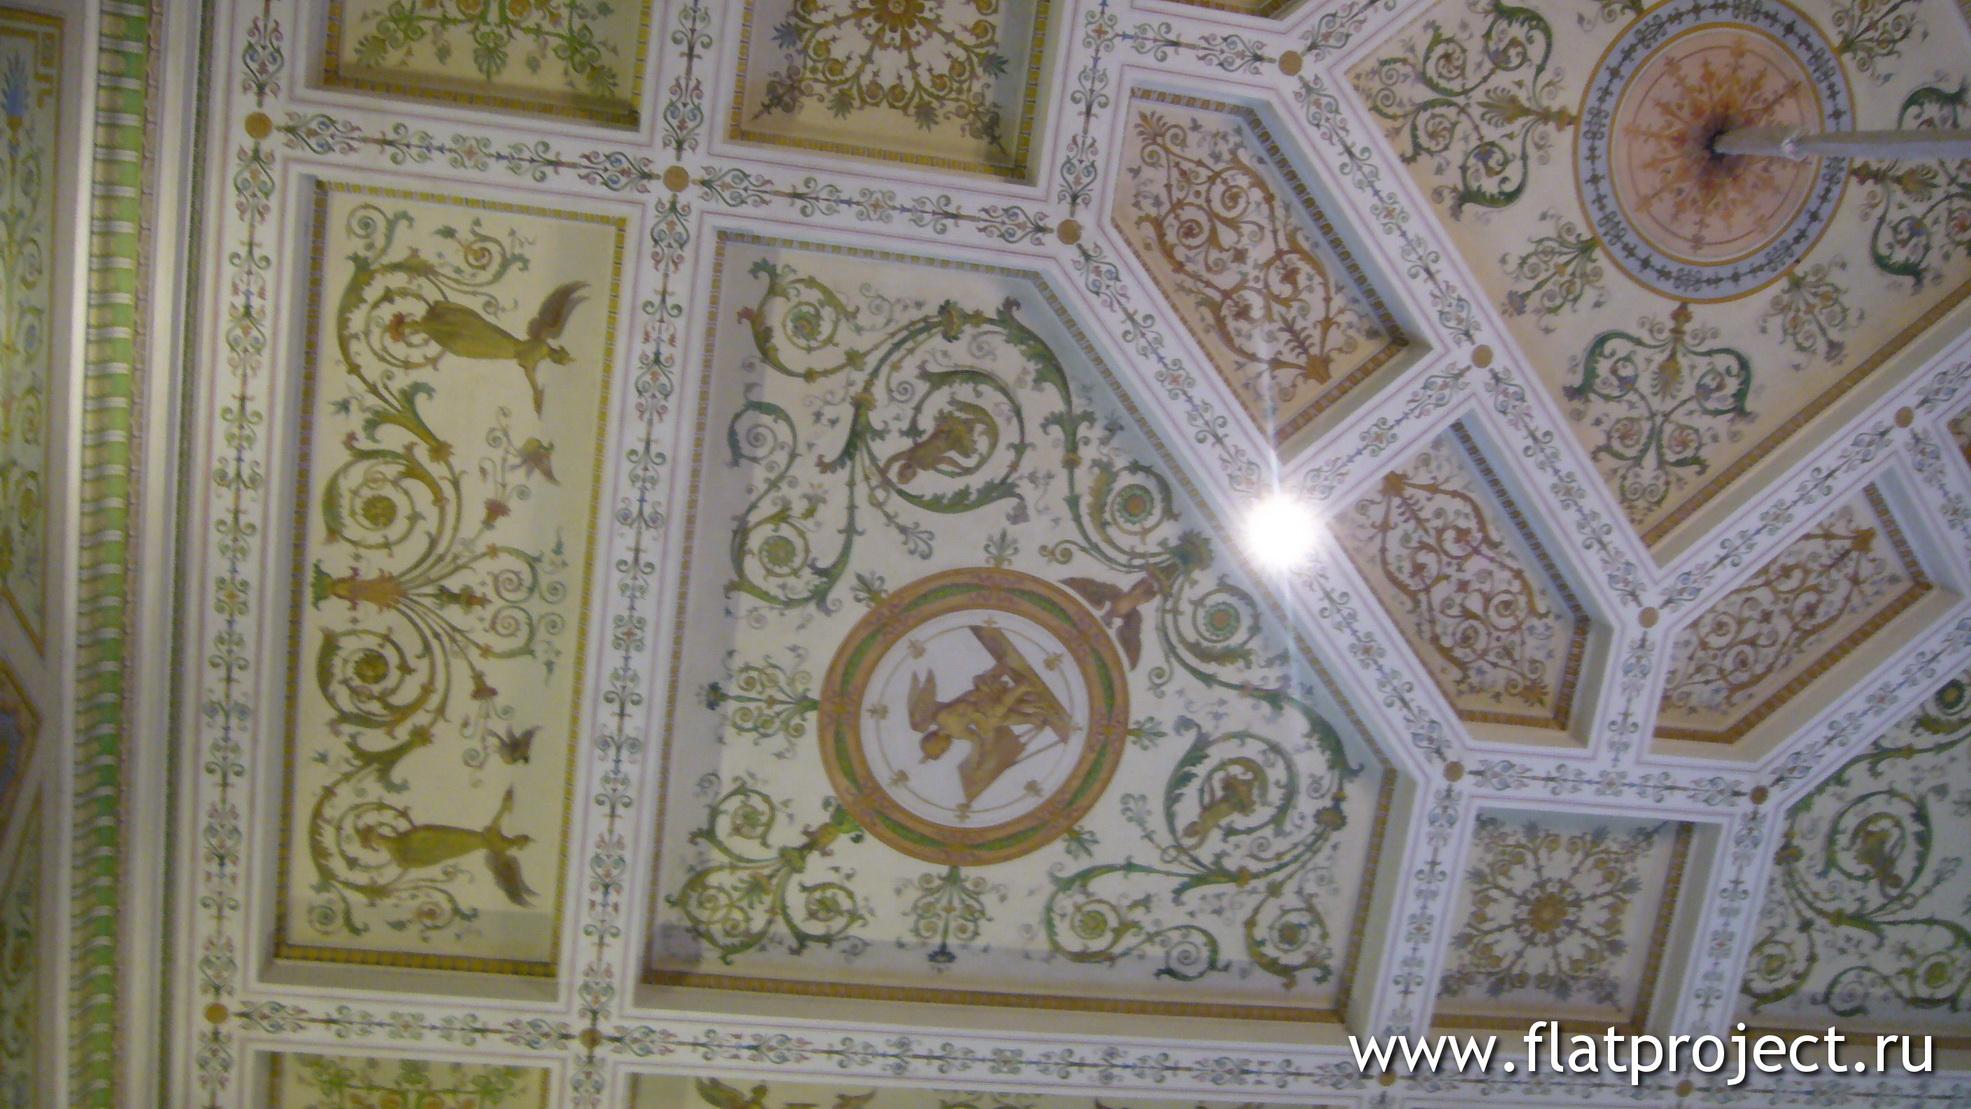 The State Hermitage museum interiors – photo 115